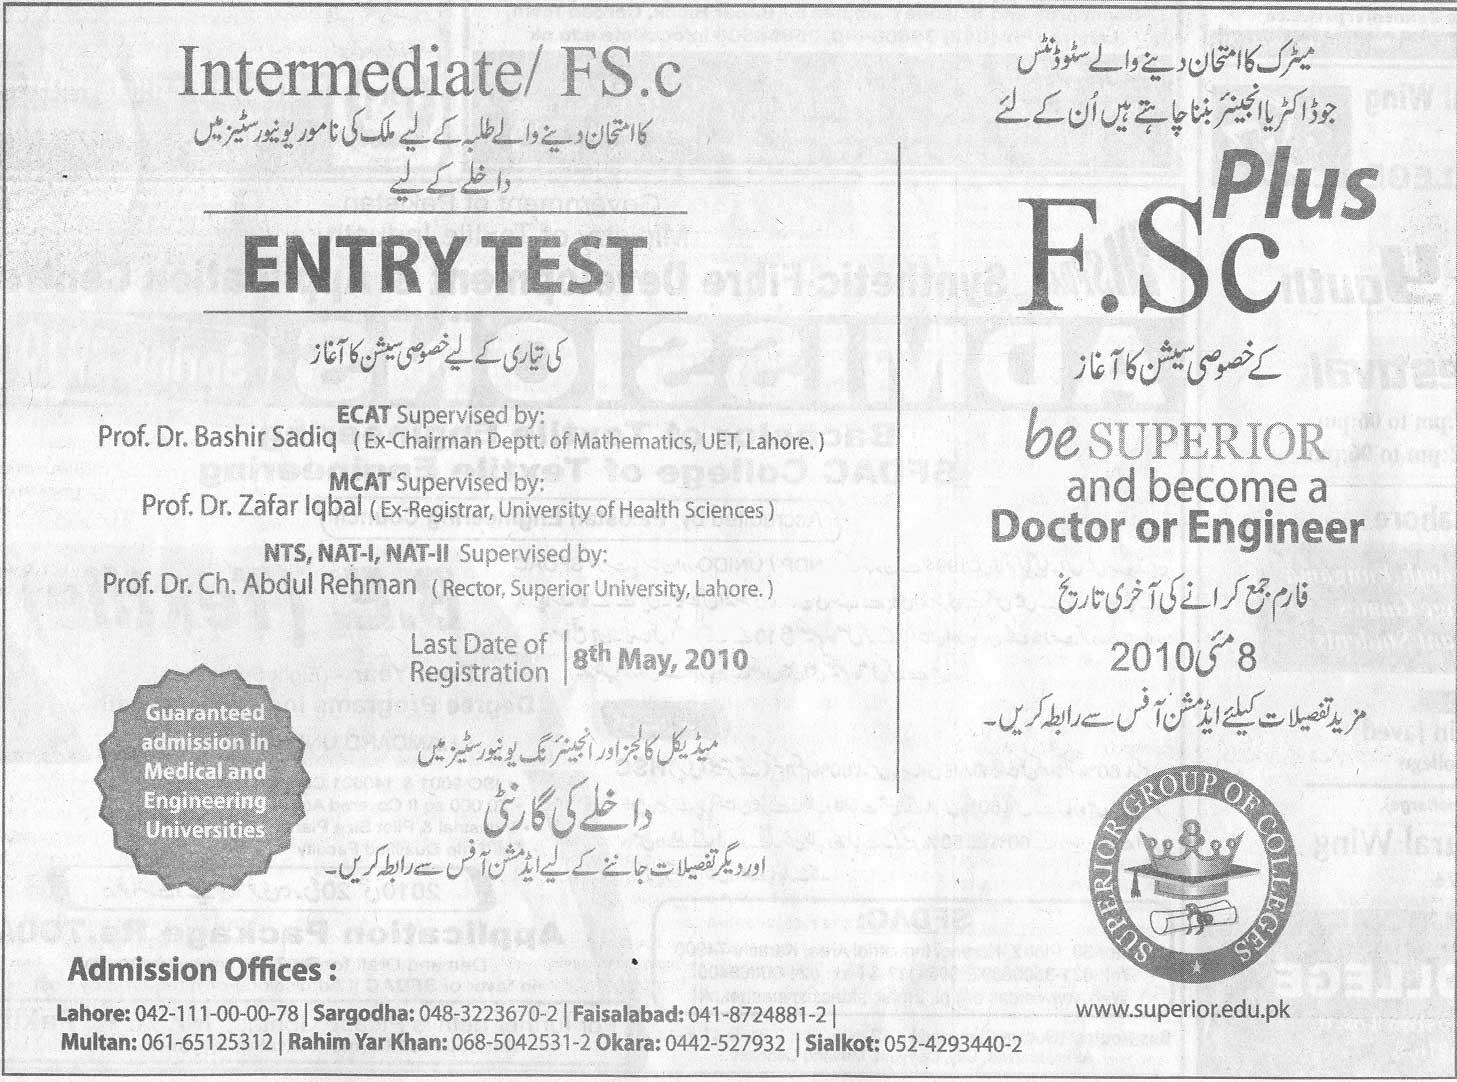 Admission in F.Sc at Superior University in Lahore